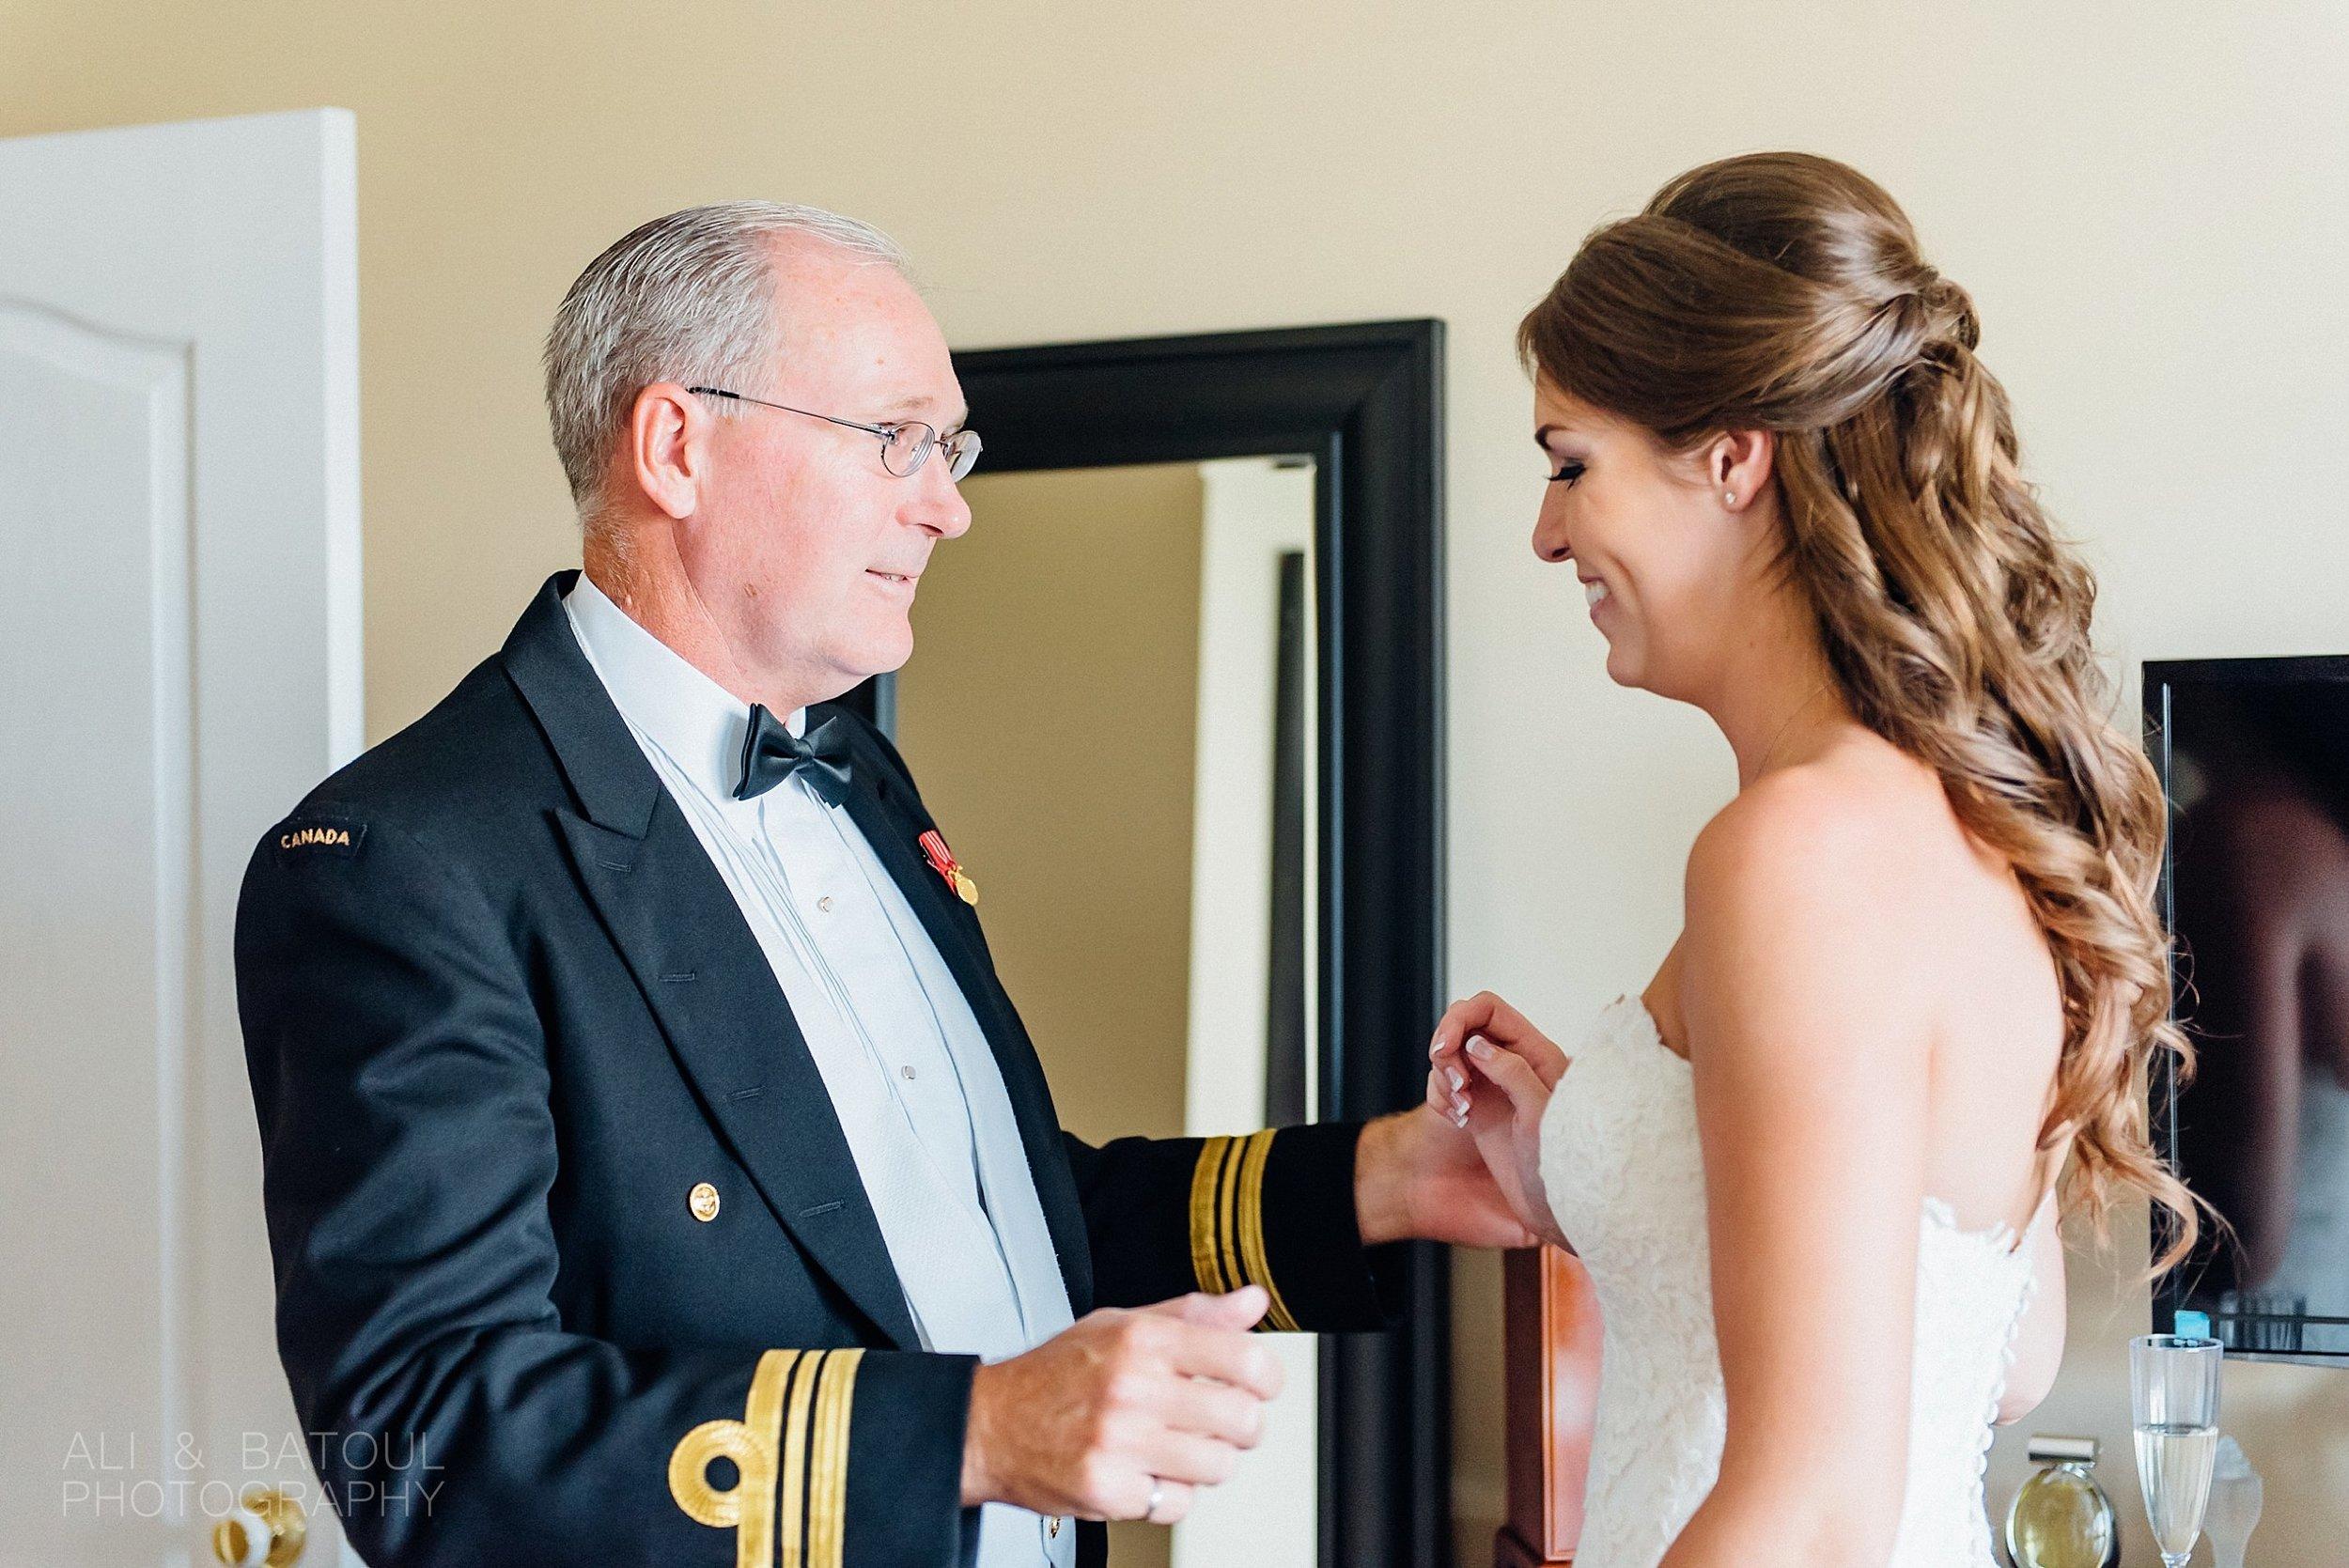 Ali & Batoul Photography - Documentary Fine Art Ottawa Wedding Photography_0011.jpg